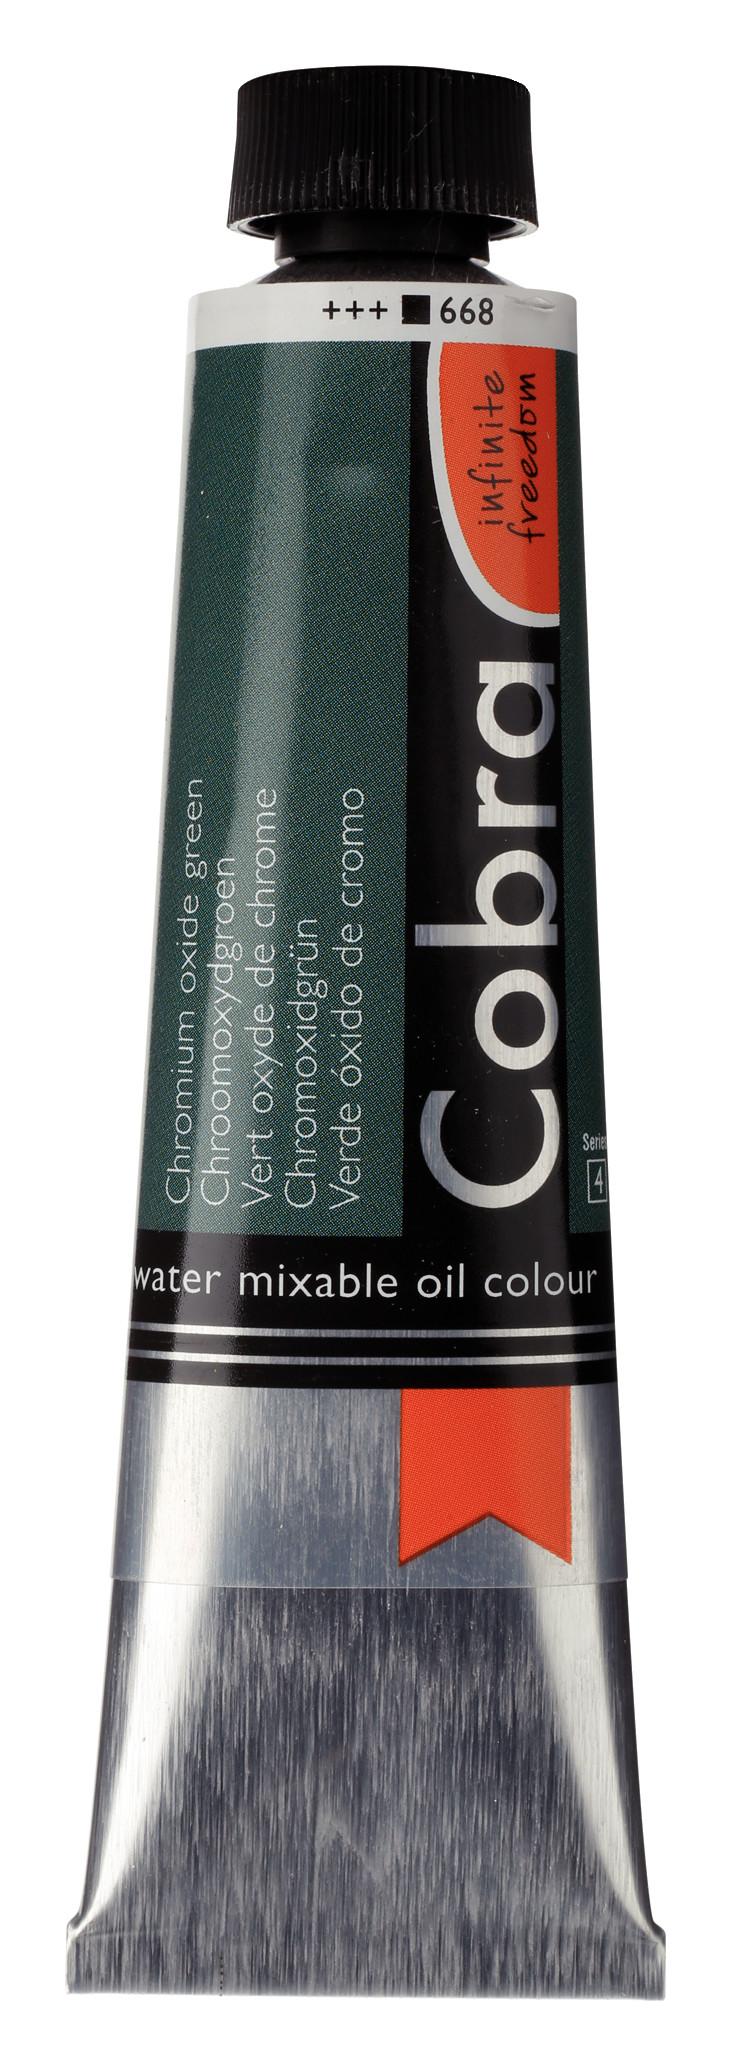 Cobra Artist Water Mixable Oil Colour Tube 40 ml Chromium oxide green  668